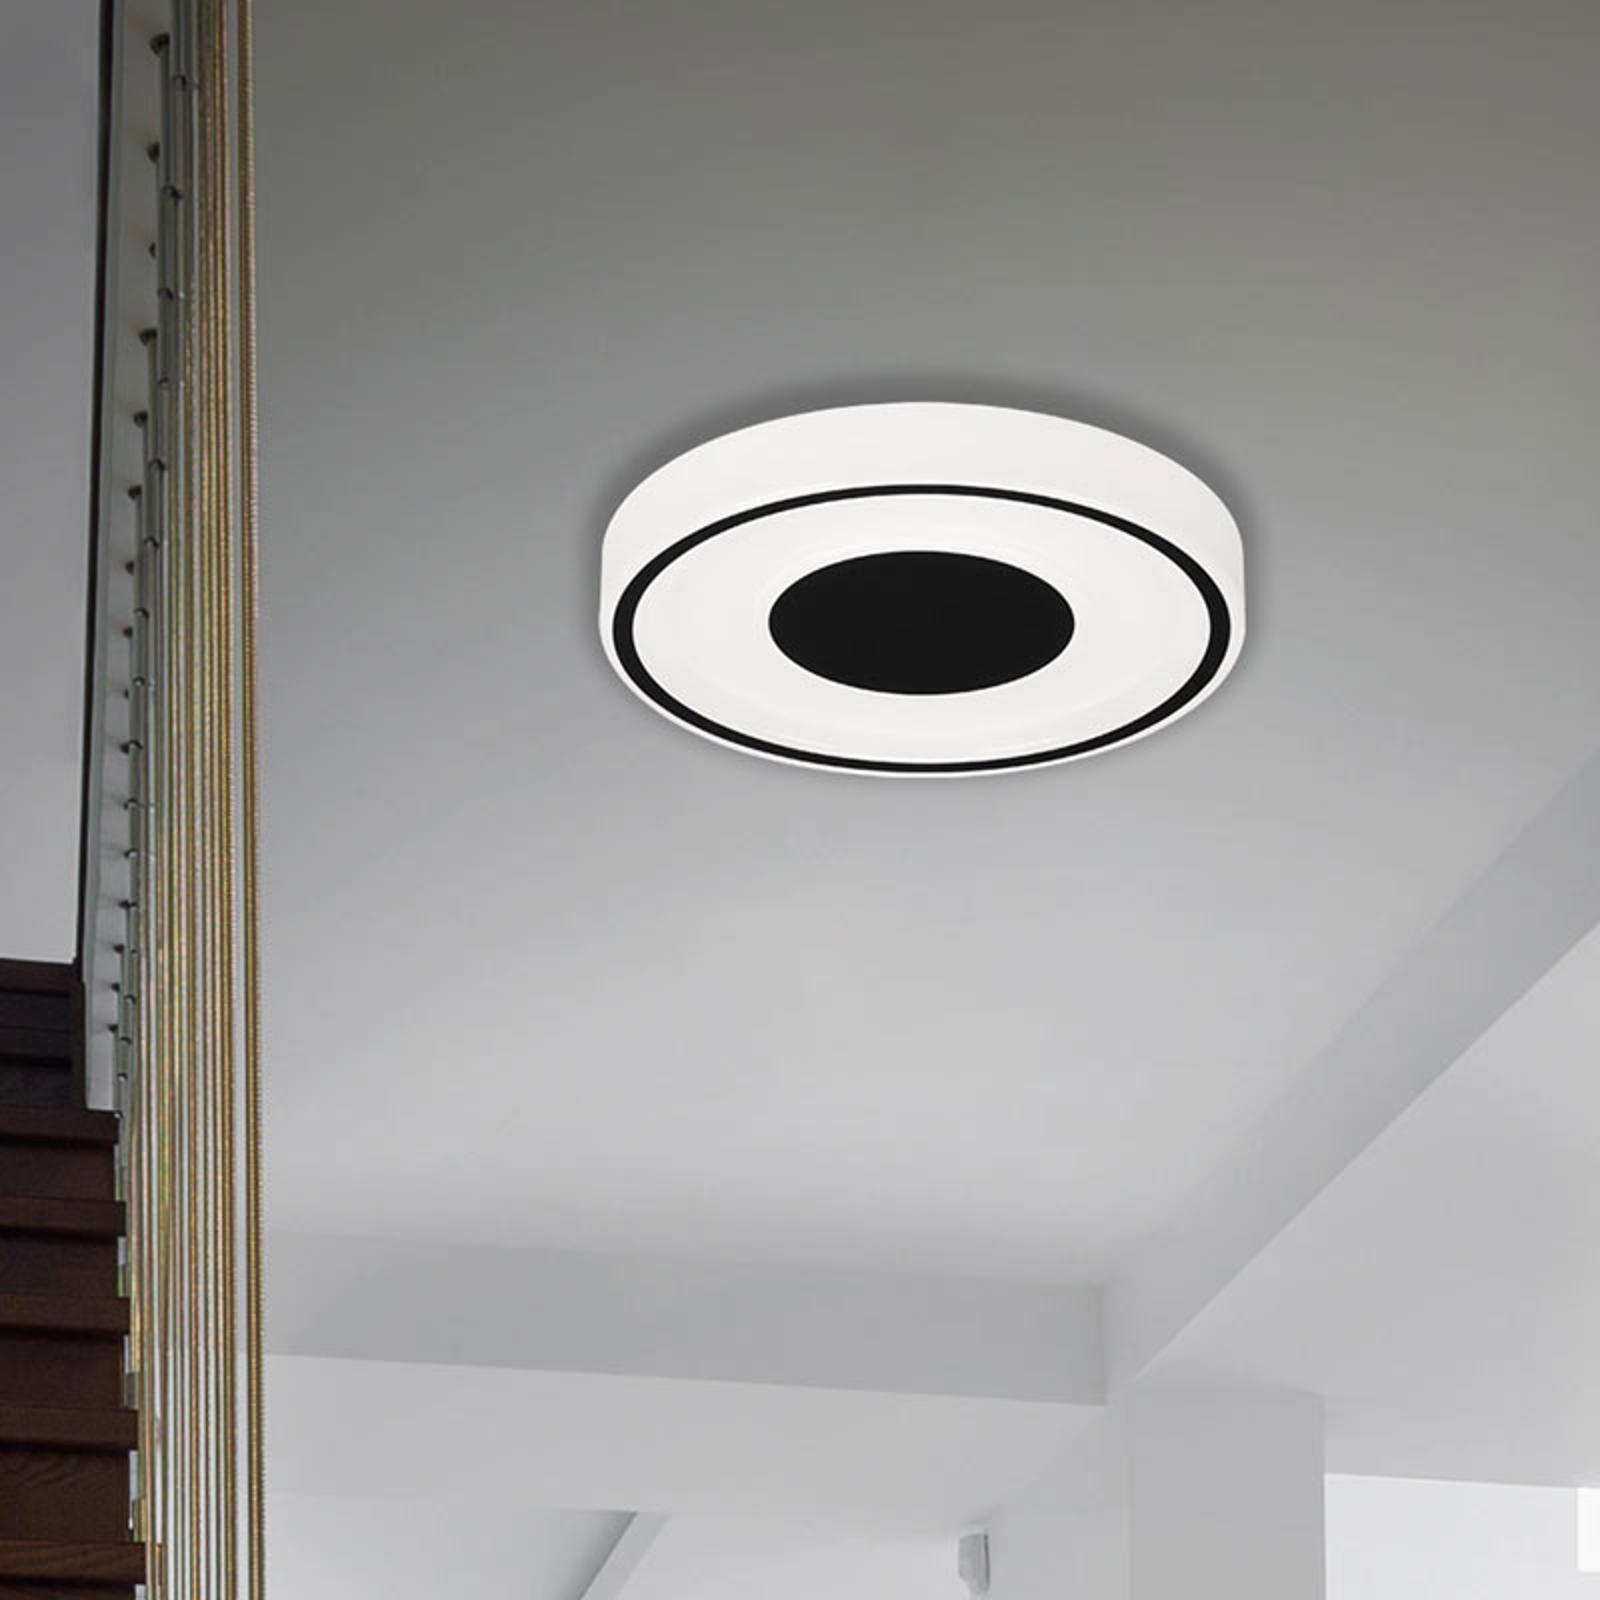 LED-taklampe Bricks, rund, svart